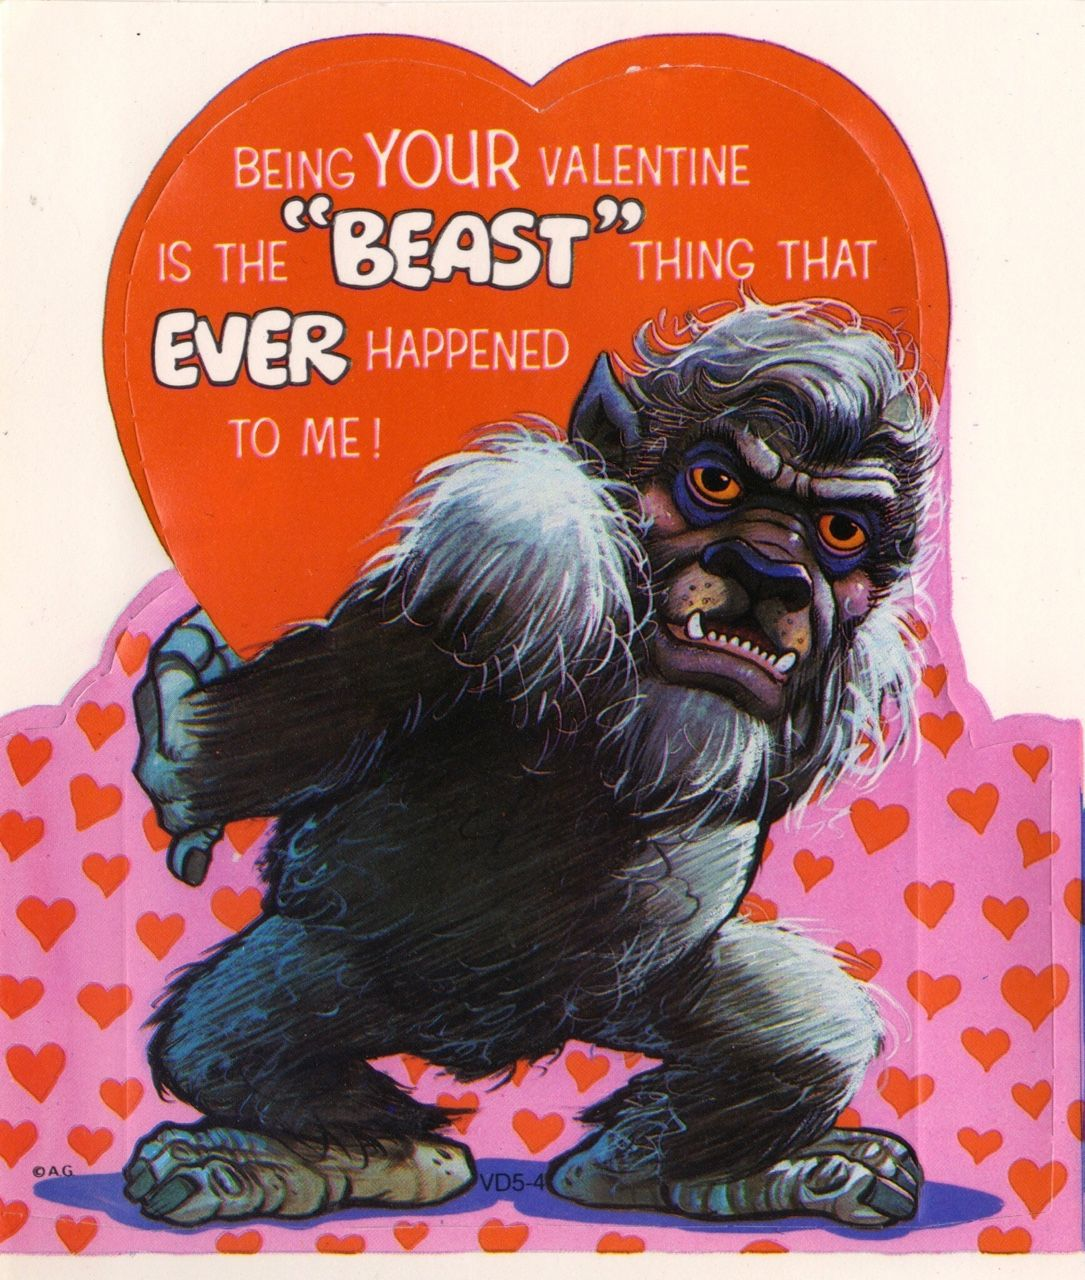 Monster valentines american greetings 1977 monsters pinterest log in monster valentines american greetings m4hsunfo